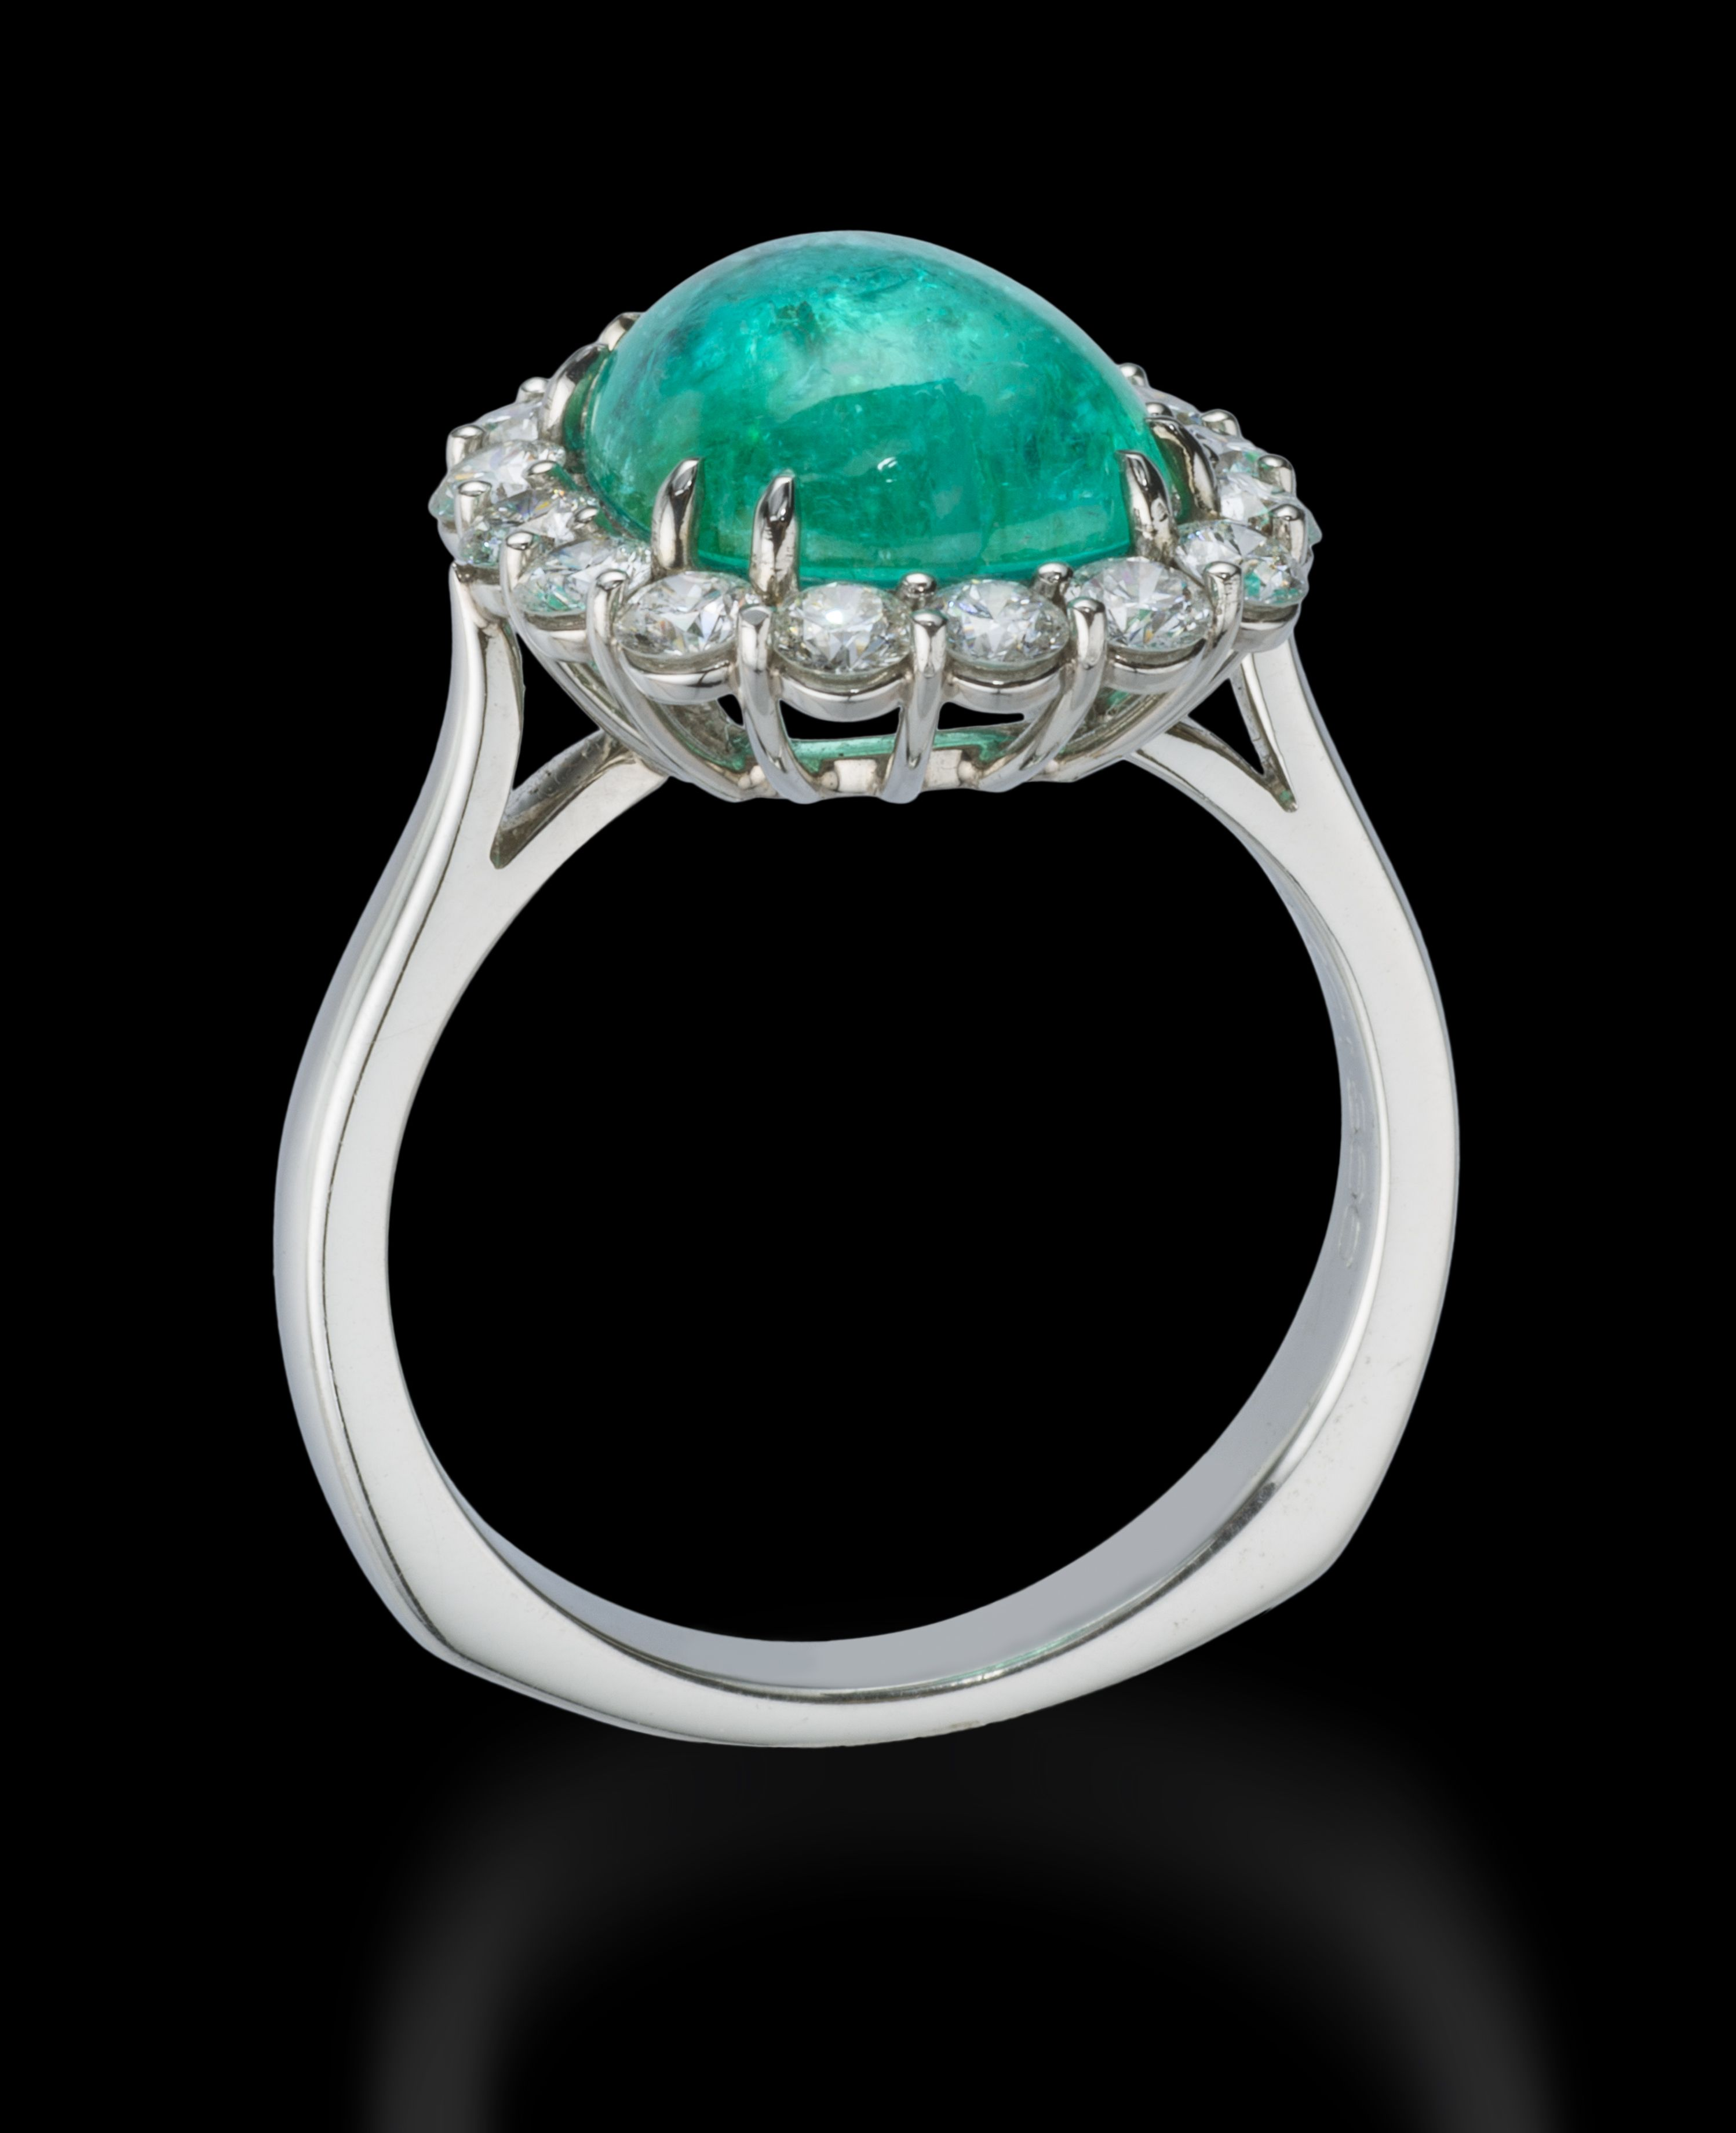 415 Carat Brazilian Cabachon Cut Paraiba Tourmaline, Diamond And Platinum  Ring #paraiba #